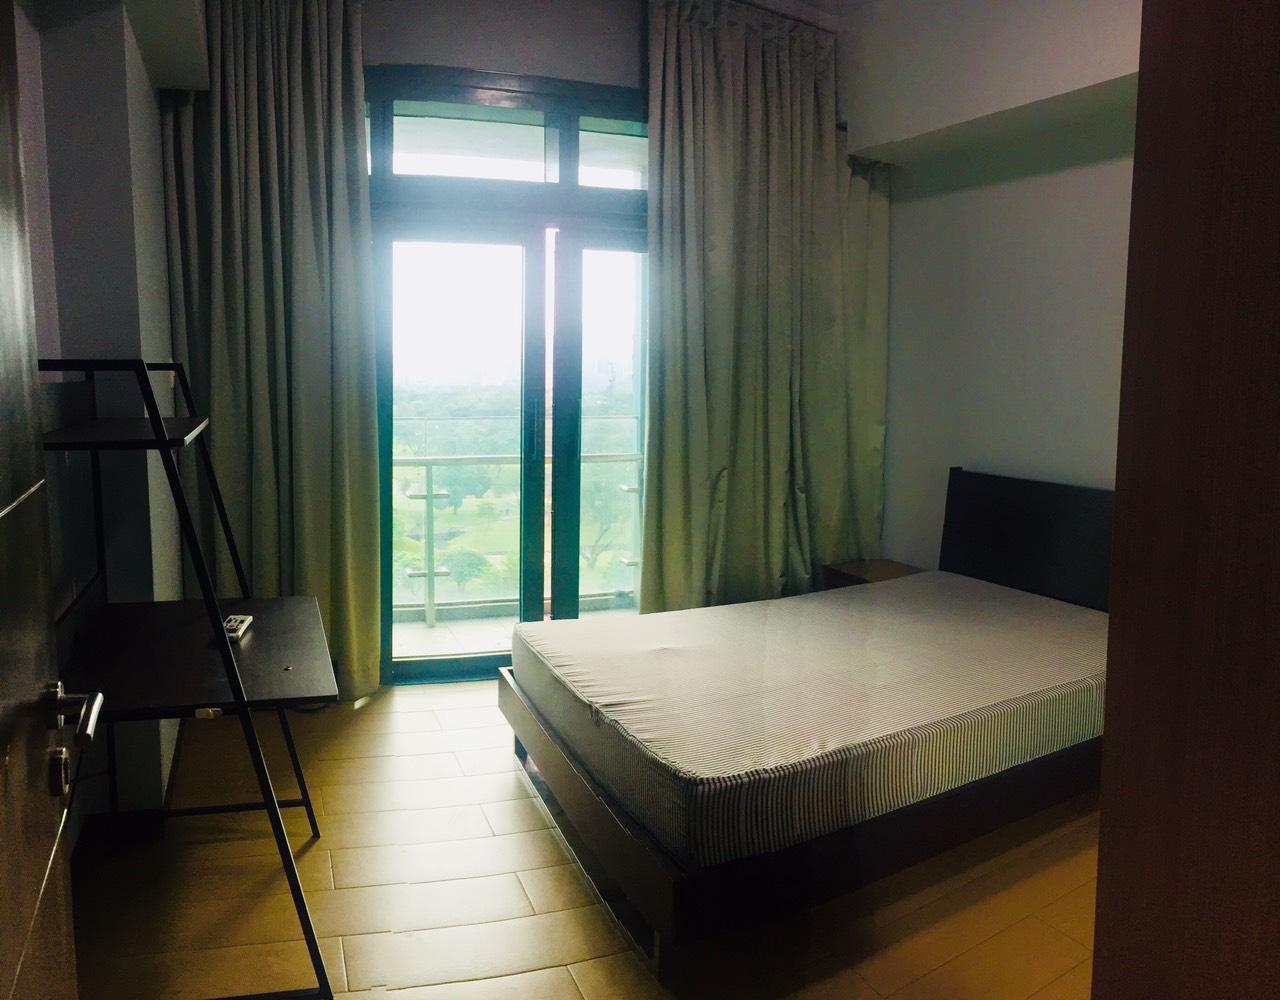 2BR Condo For Rent, 8 Forbestown Road Bedroom